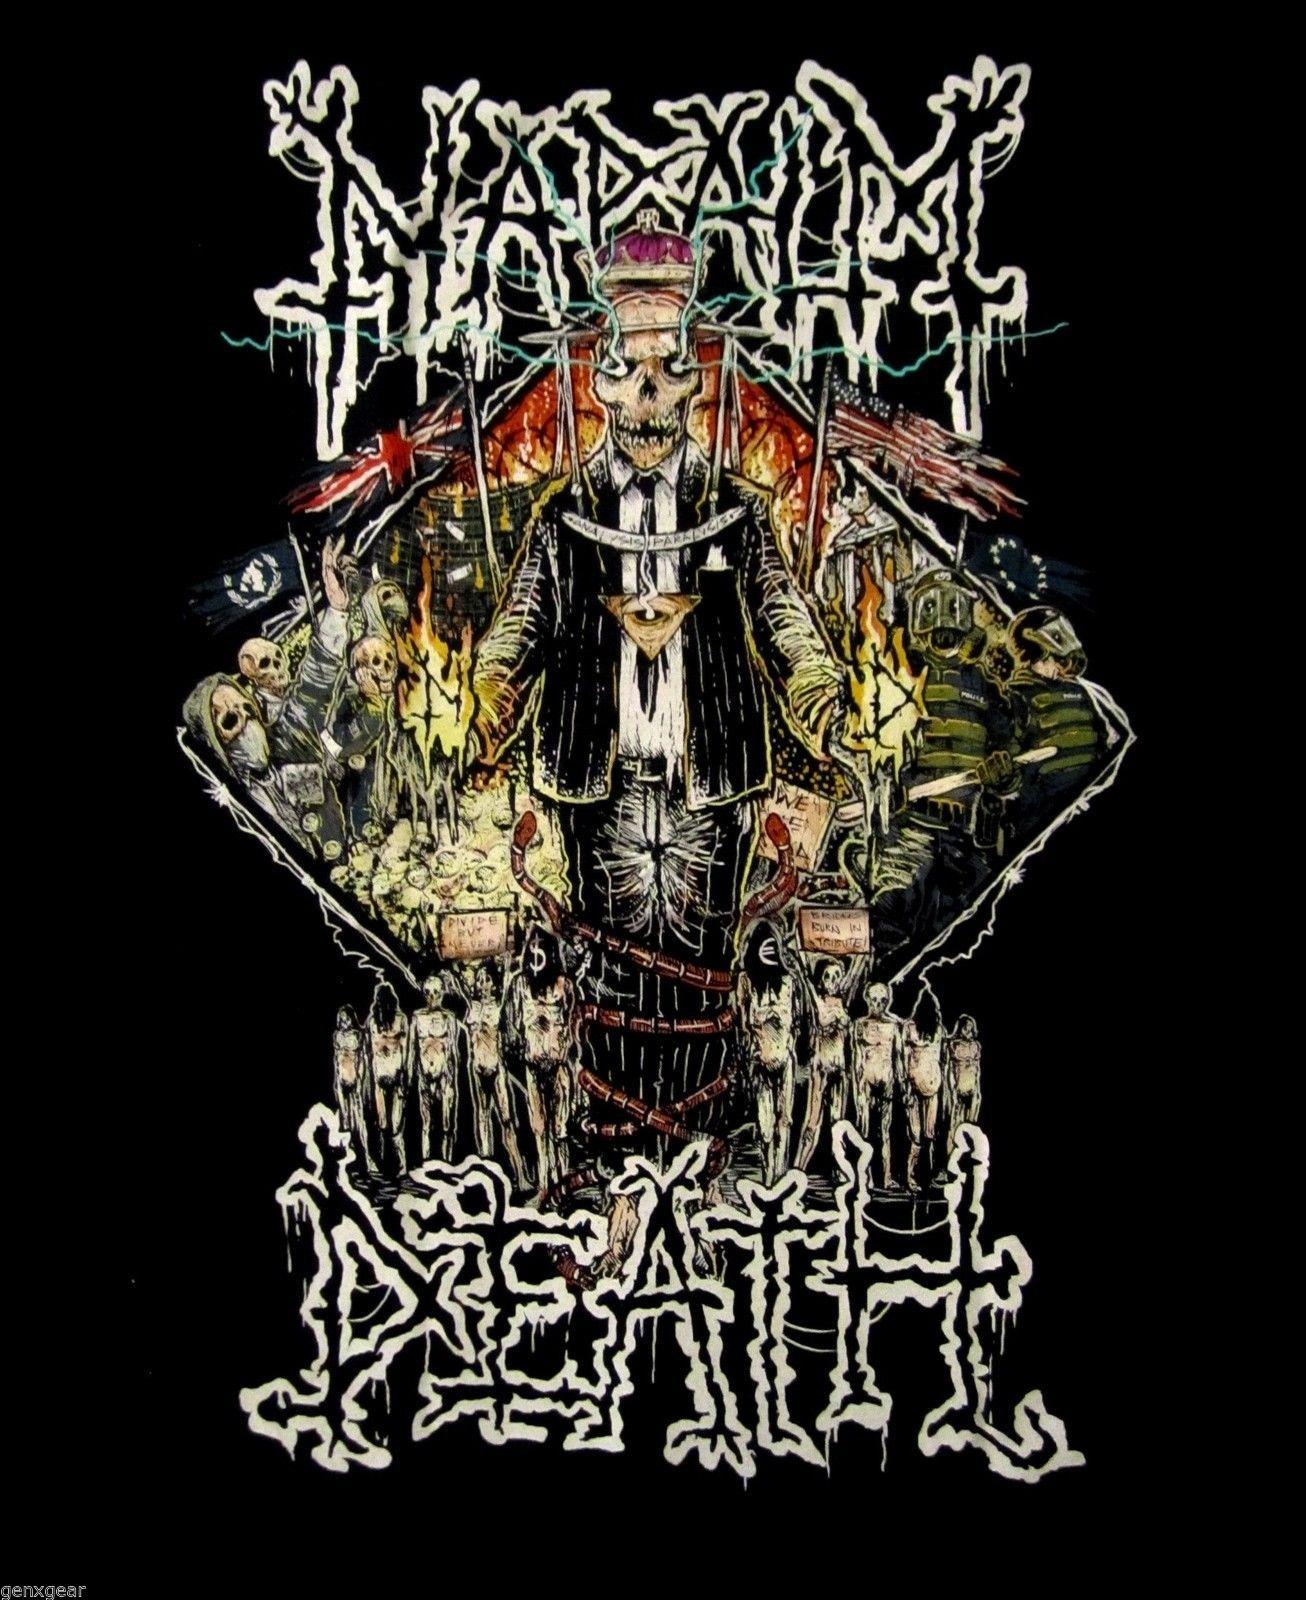 Design t shirt artwork - Napalm Death New Shirt Design